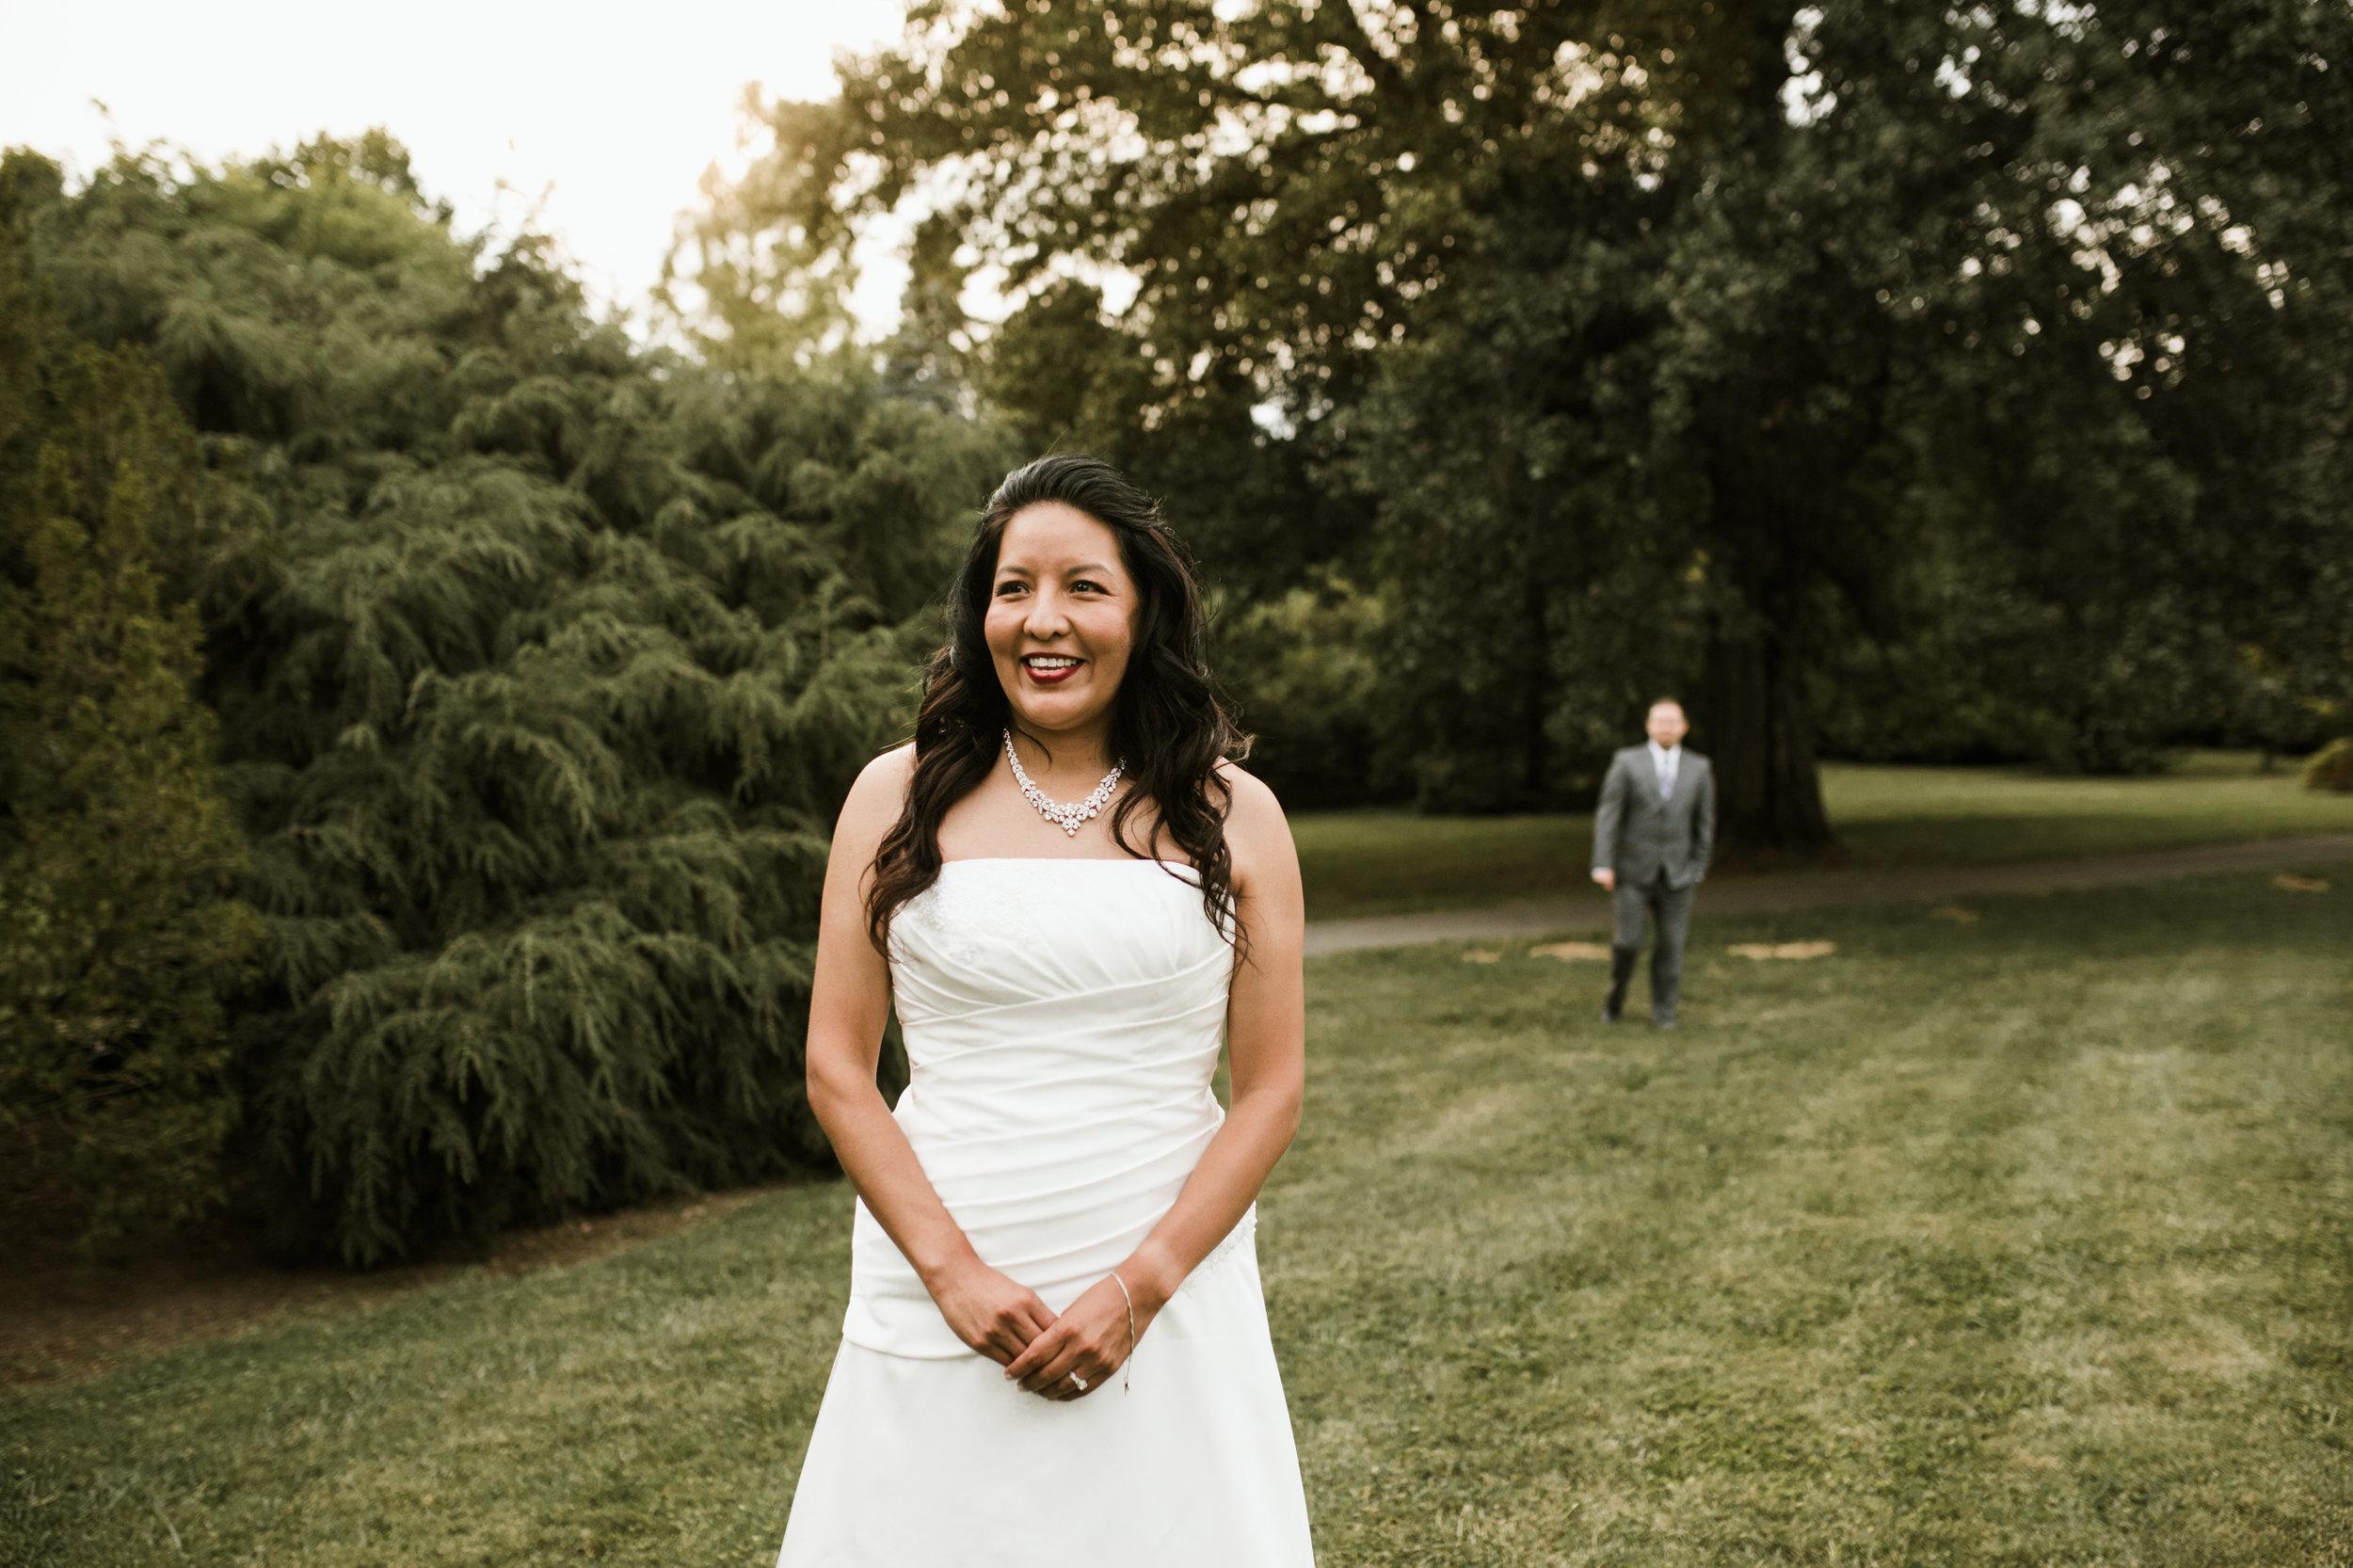 Kentucky Wedding Louisville Wedding Photographer 2018 Crystal Ludwick Photo Louisville Wedding Photographer Kentucky Wedding Photographer (15 of 76).jpg